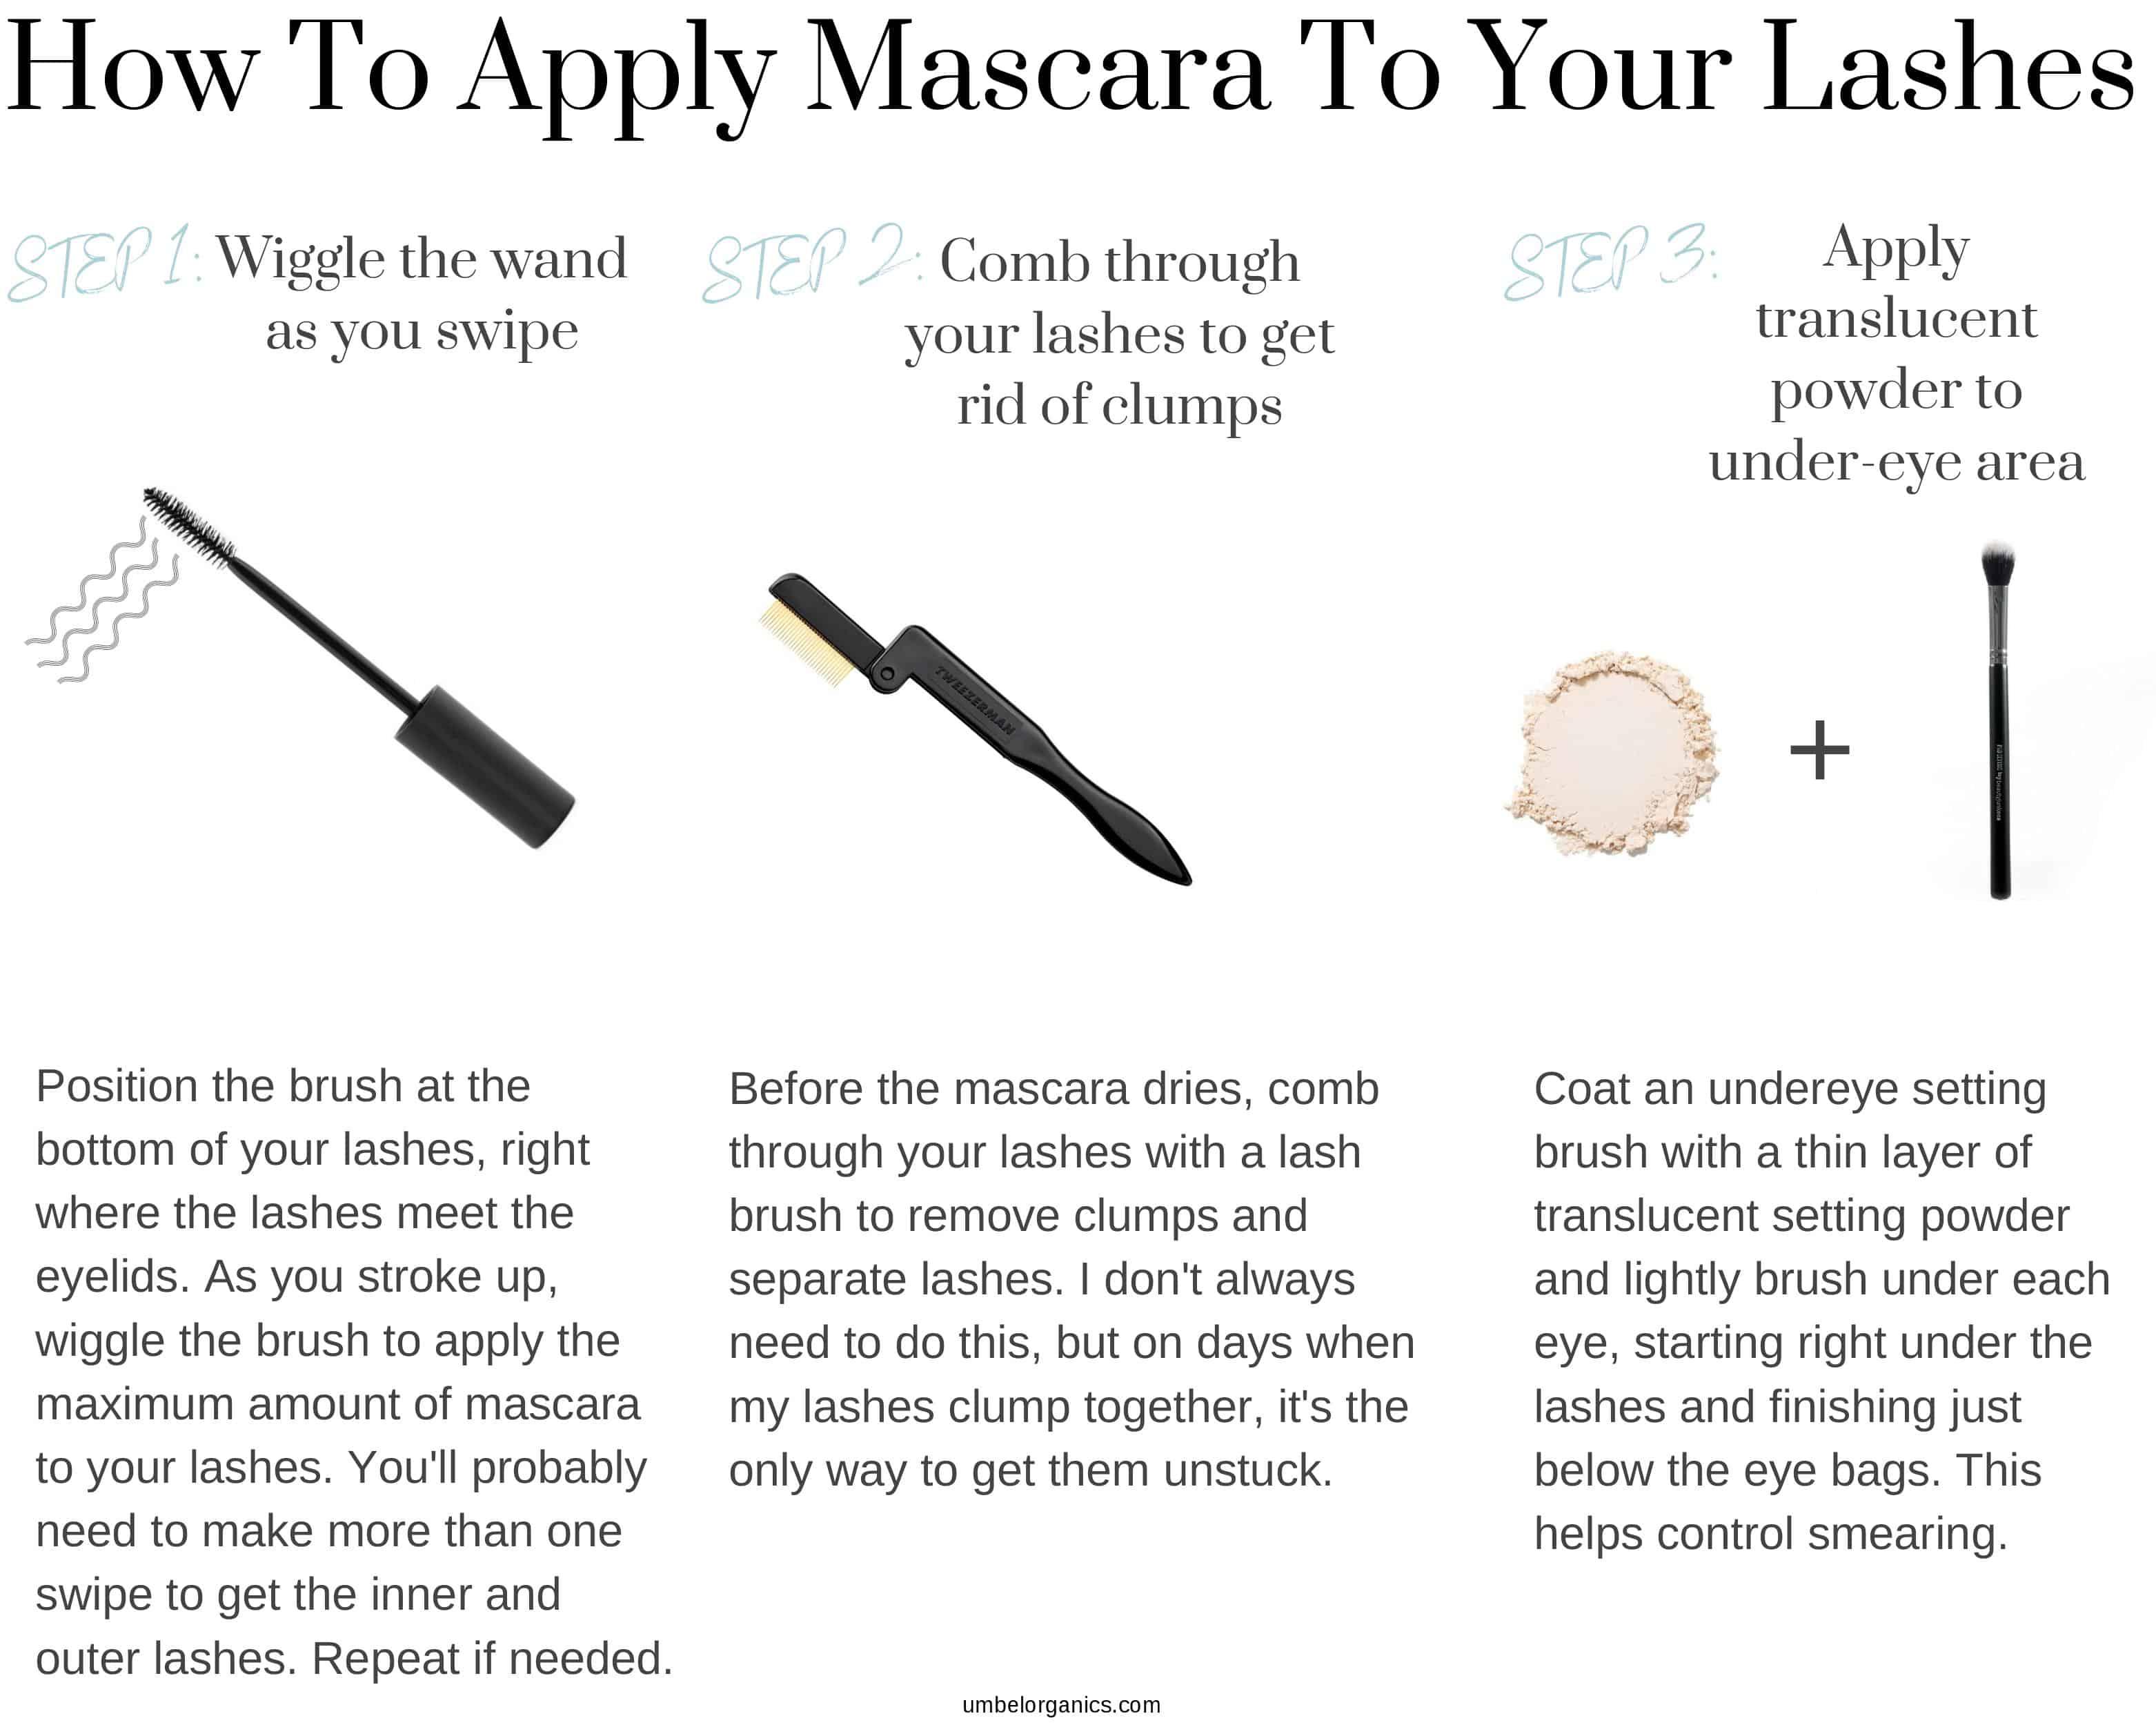 3 Steps to apply mascara